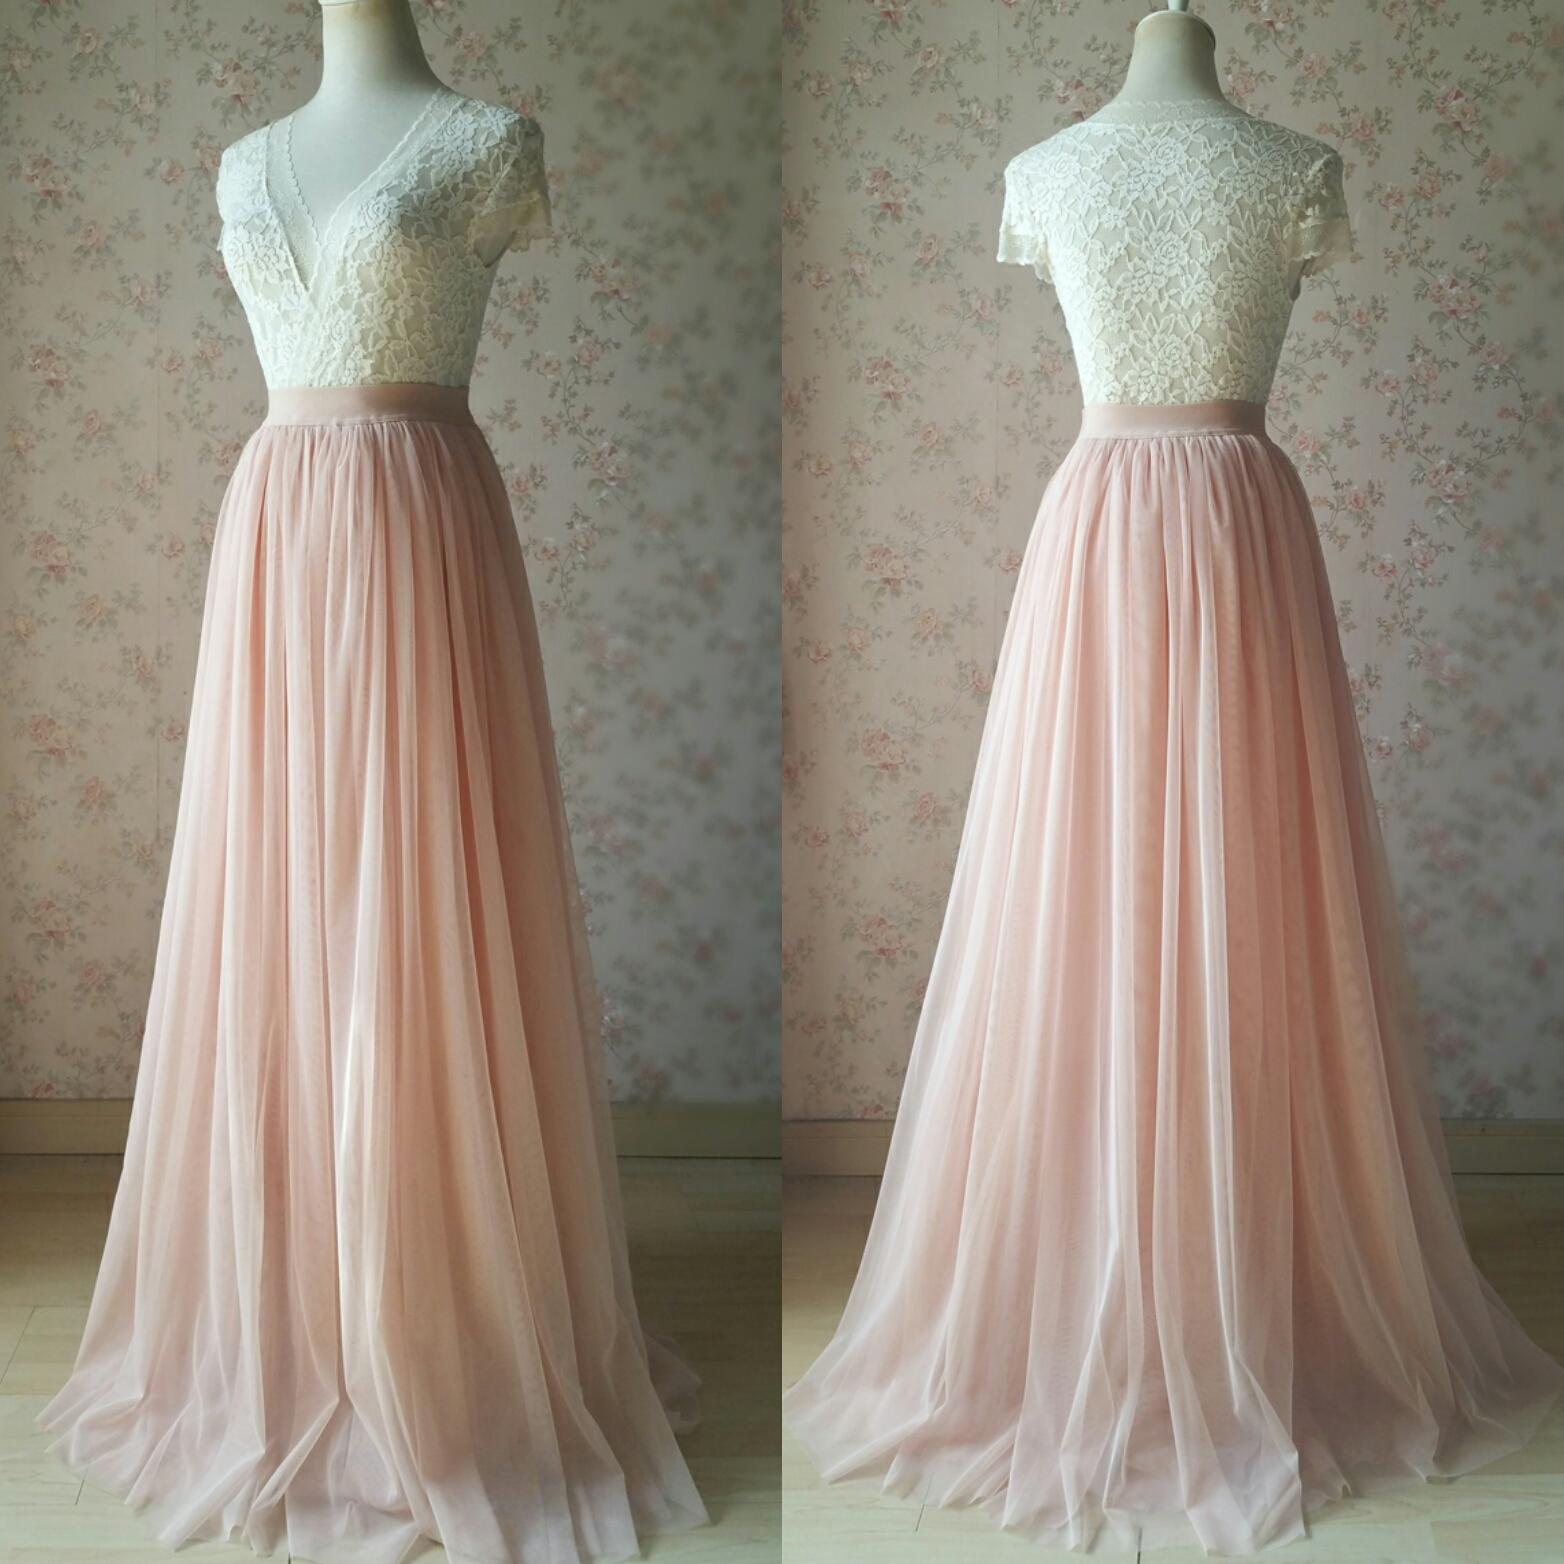 DARK GRAY Maxi Tulle Skirt For Wedding Dark Grey Wedding Bridesmaid Skirt,wd398